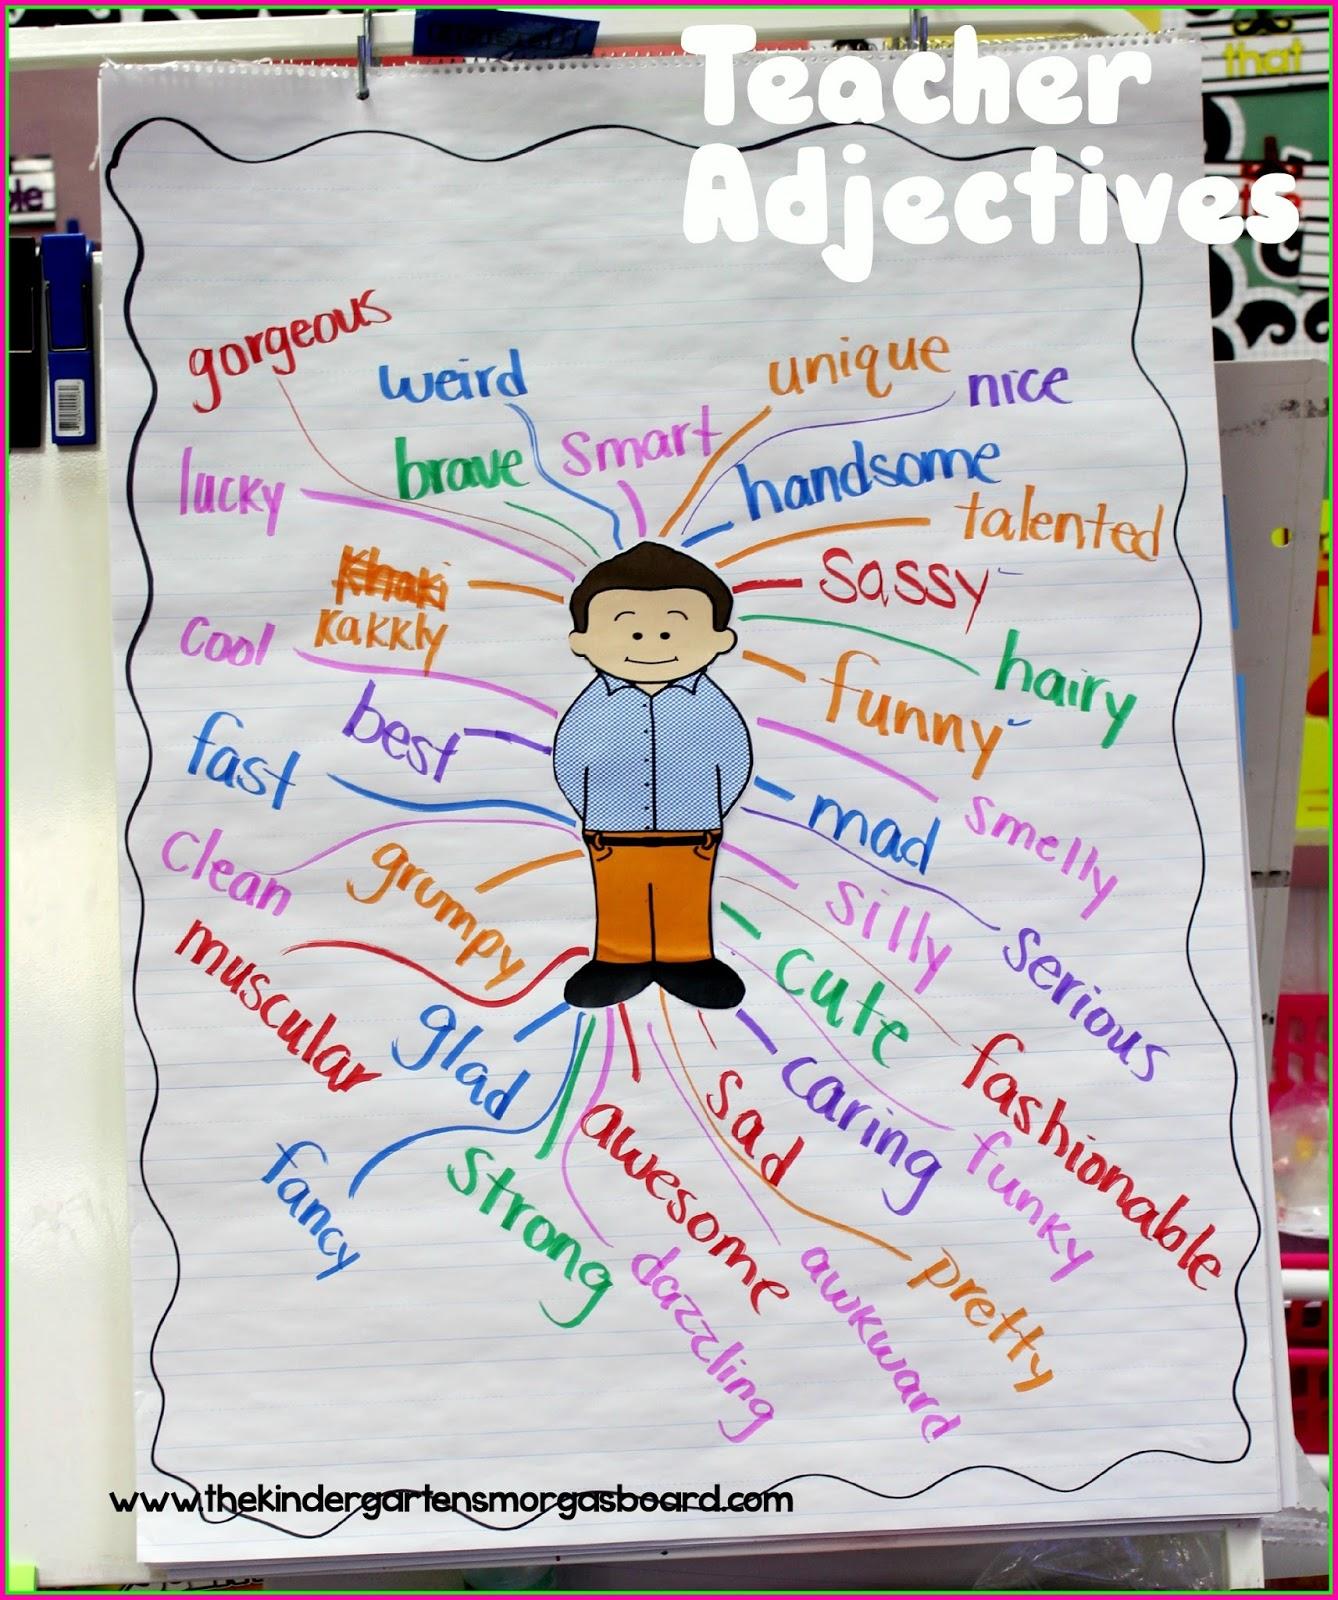 A Kindergarten Smorgasboard of Sparkling Adjectives! | Smedley's ...